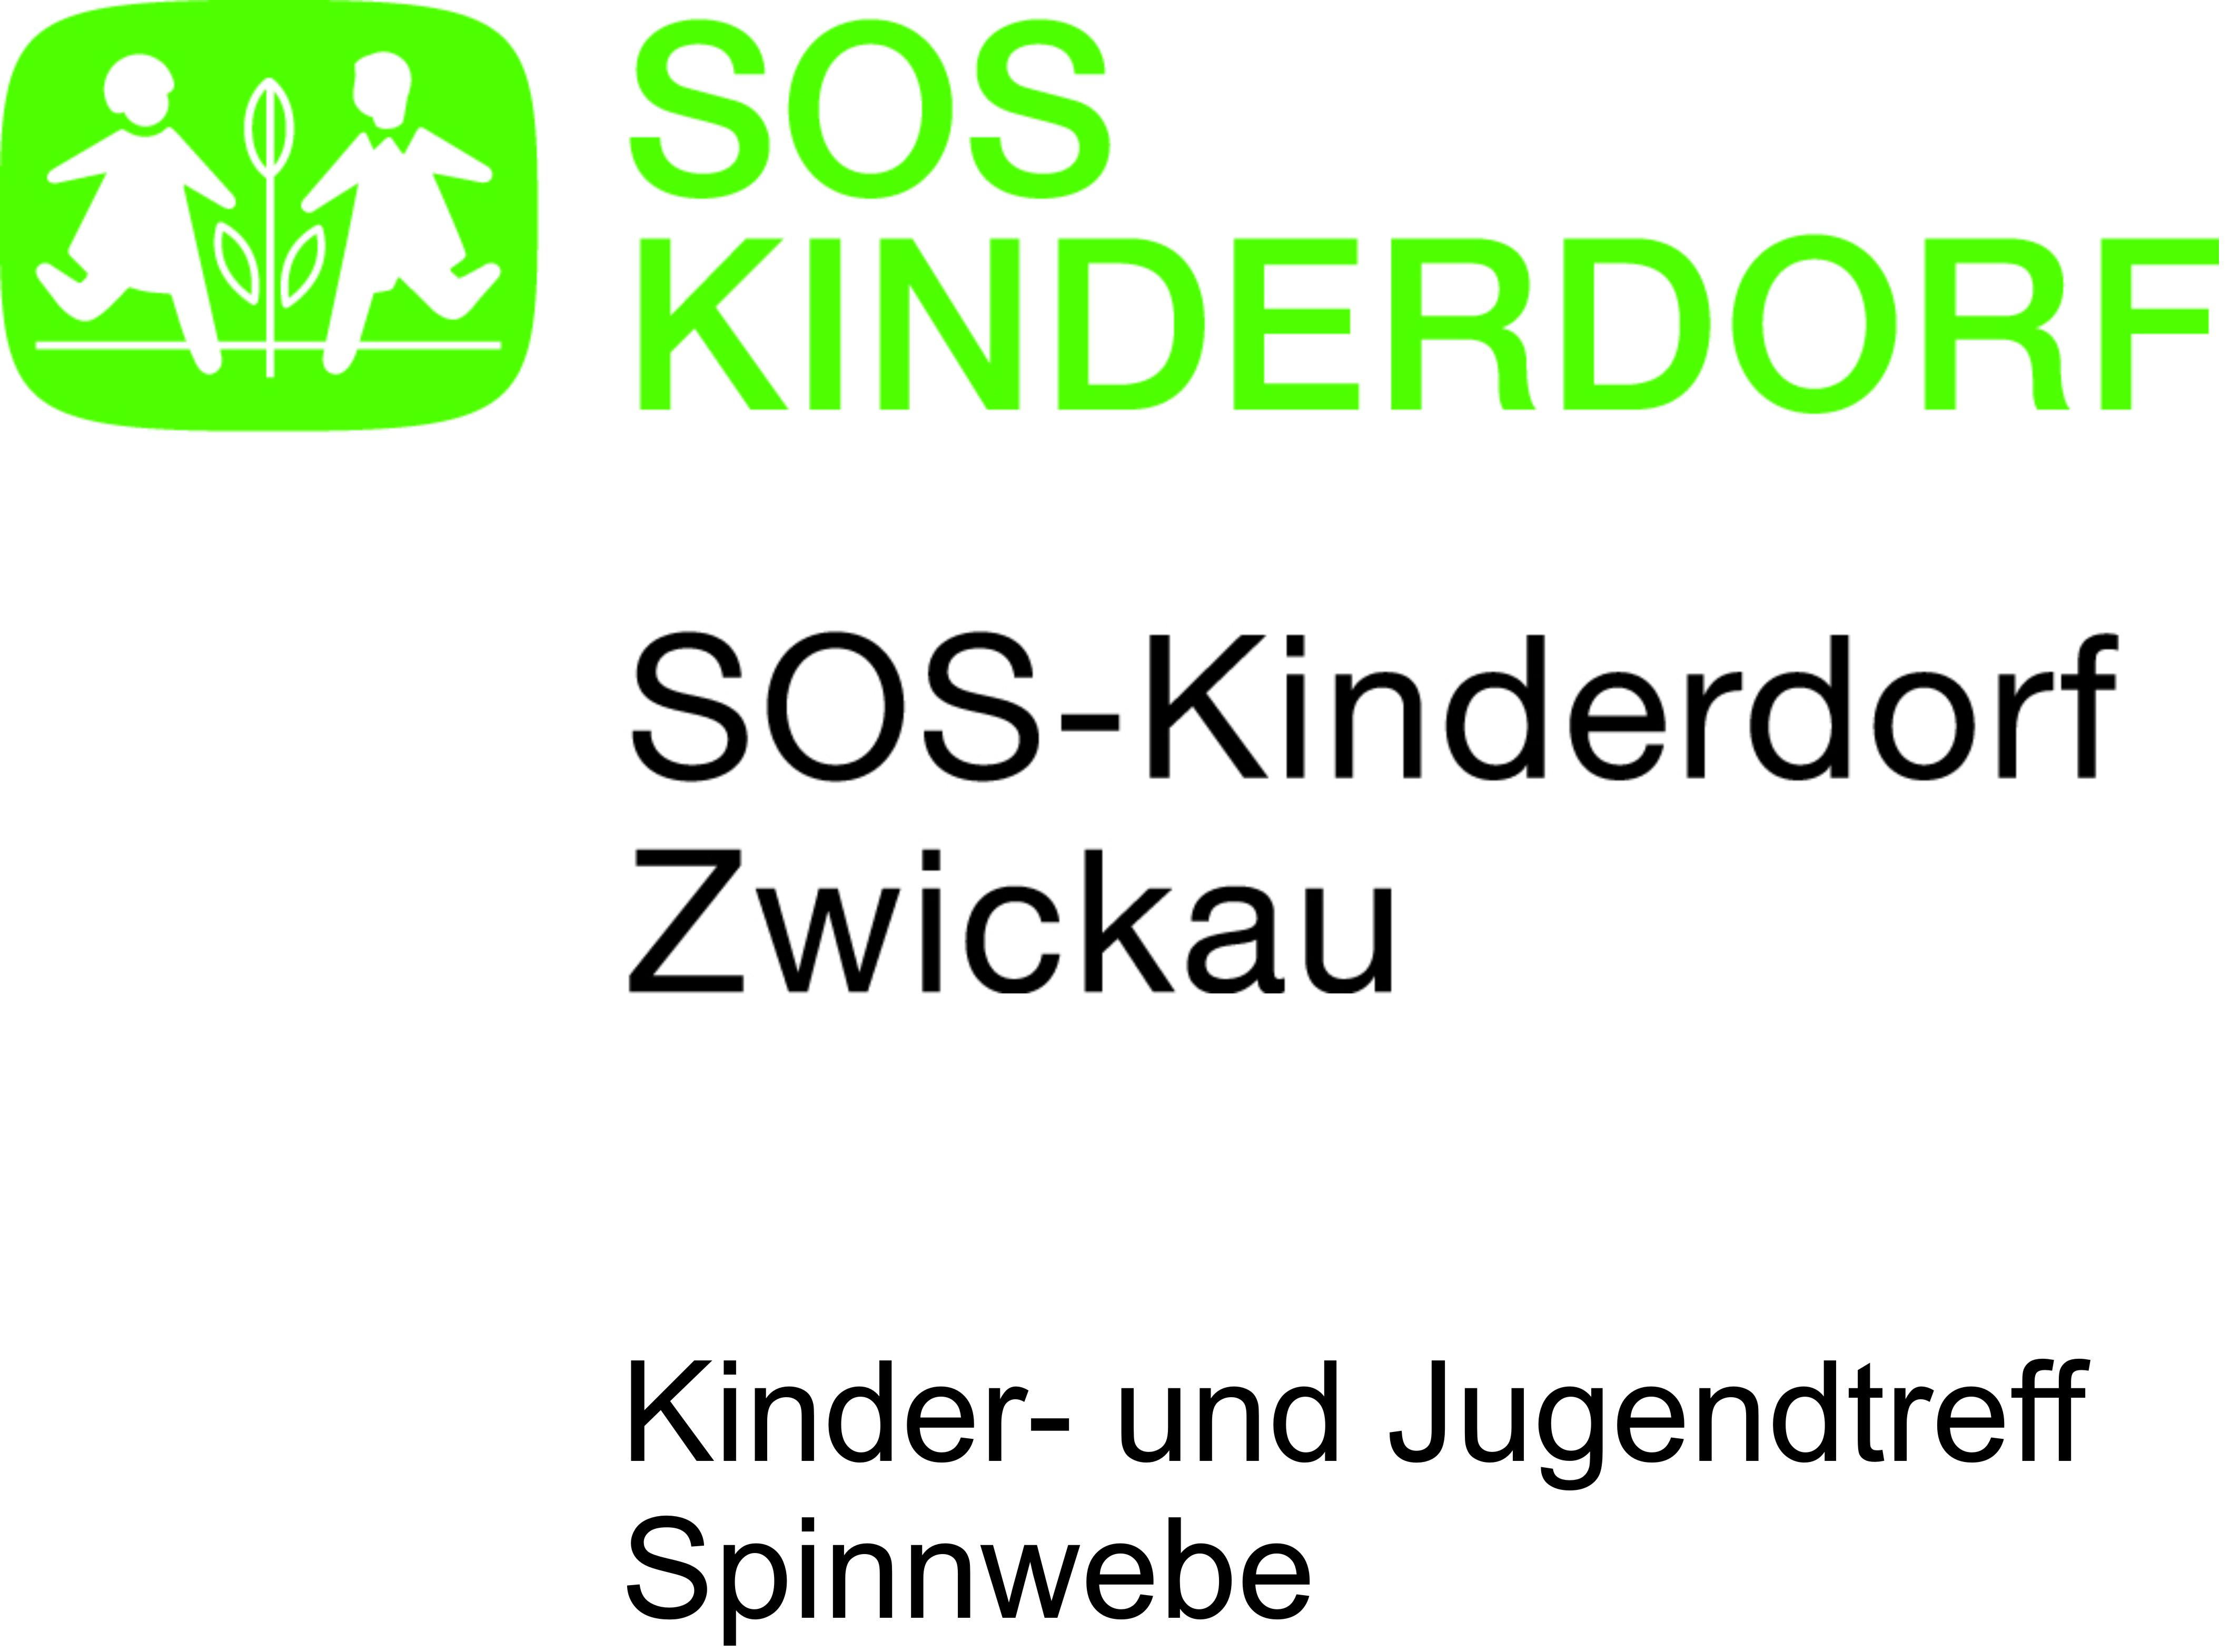 SOS Kinderdorf Zwickau